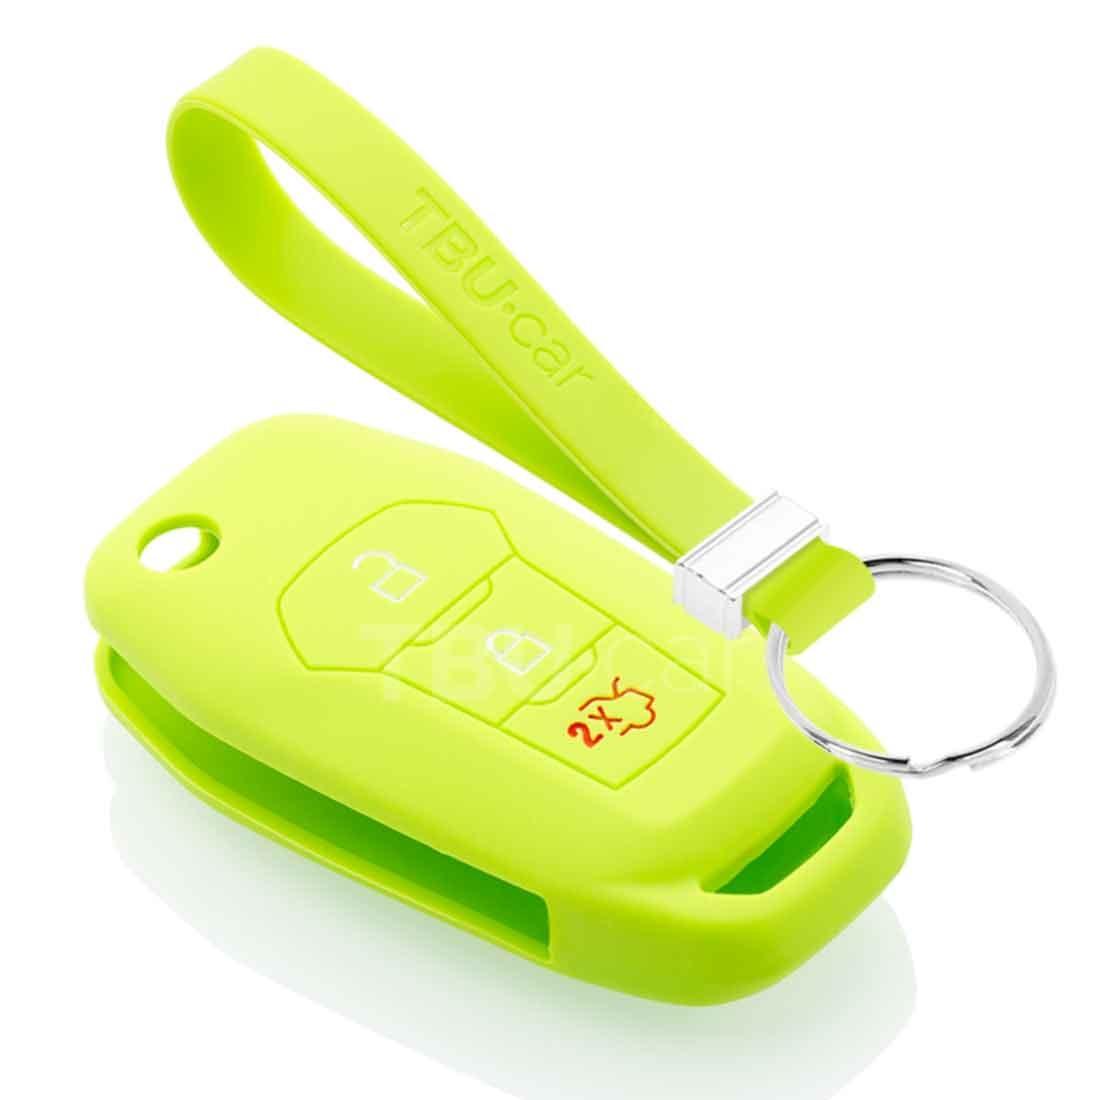 TBU car TBU car Autoschlüssel Hülle kompatibel mit Ford 3 Tasten - Schutzhülle aus Silikon - Auto Schlüsselhülle Cover in Lindgrün